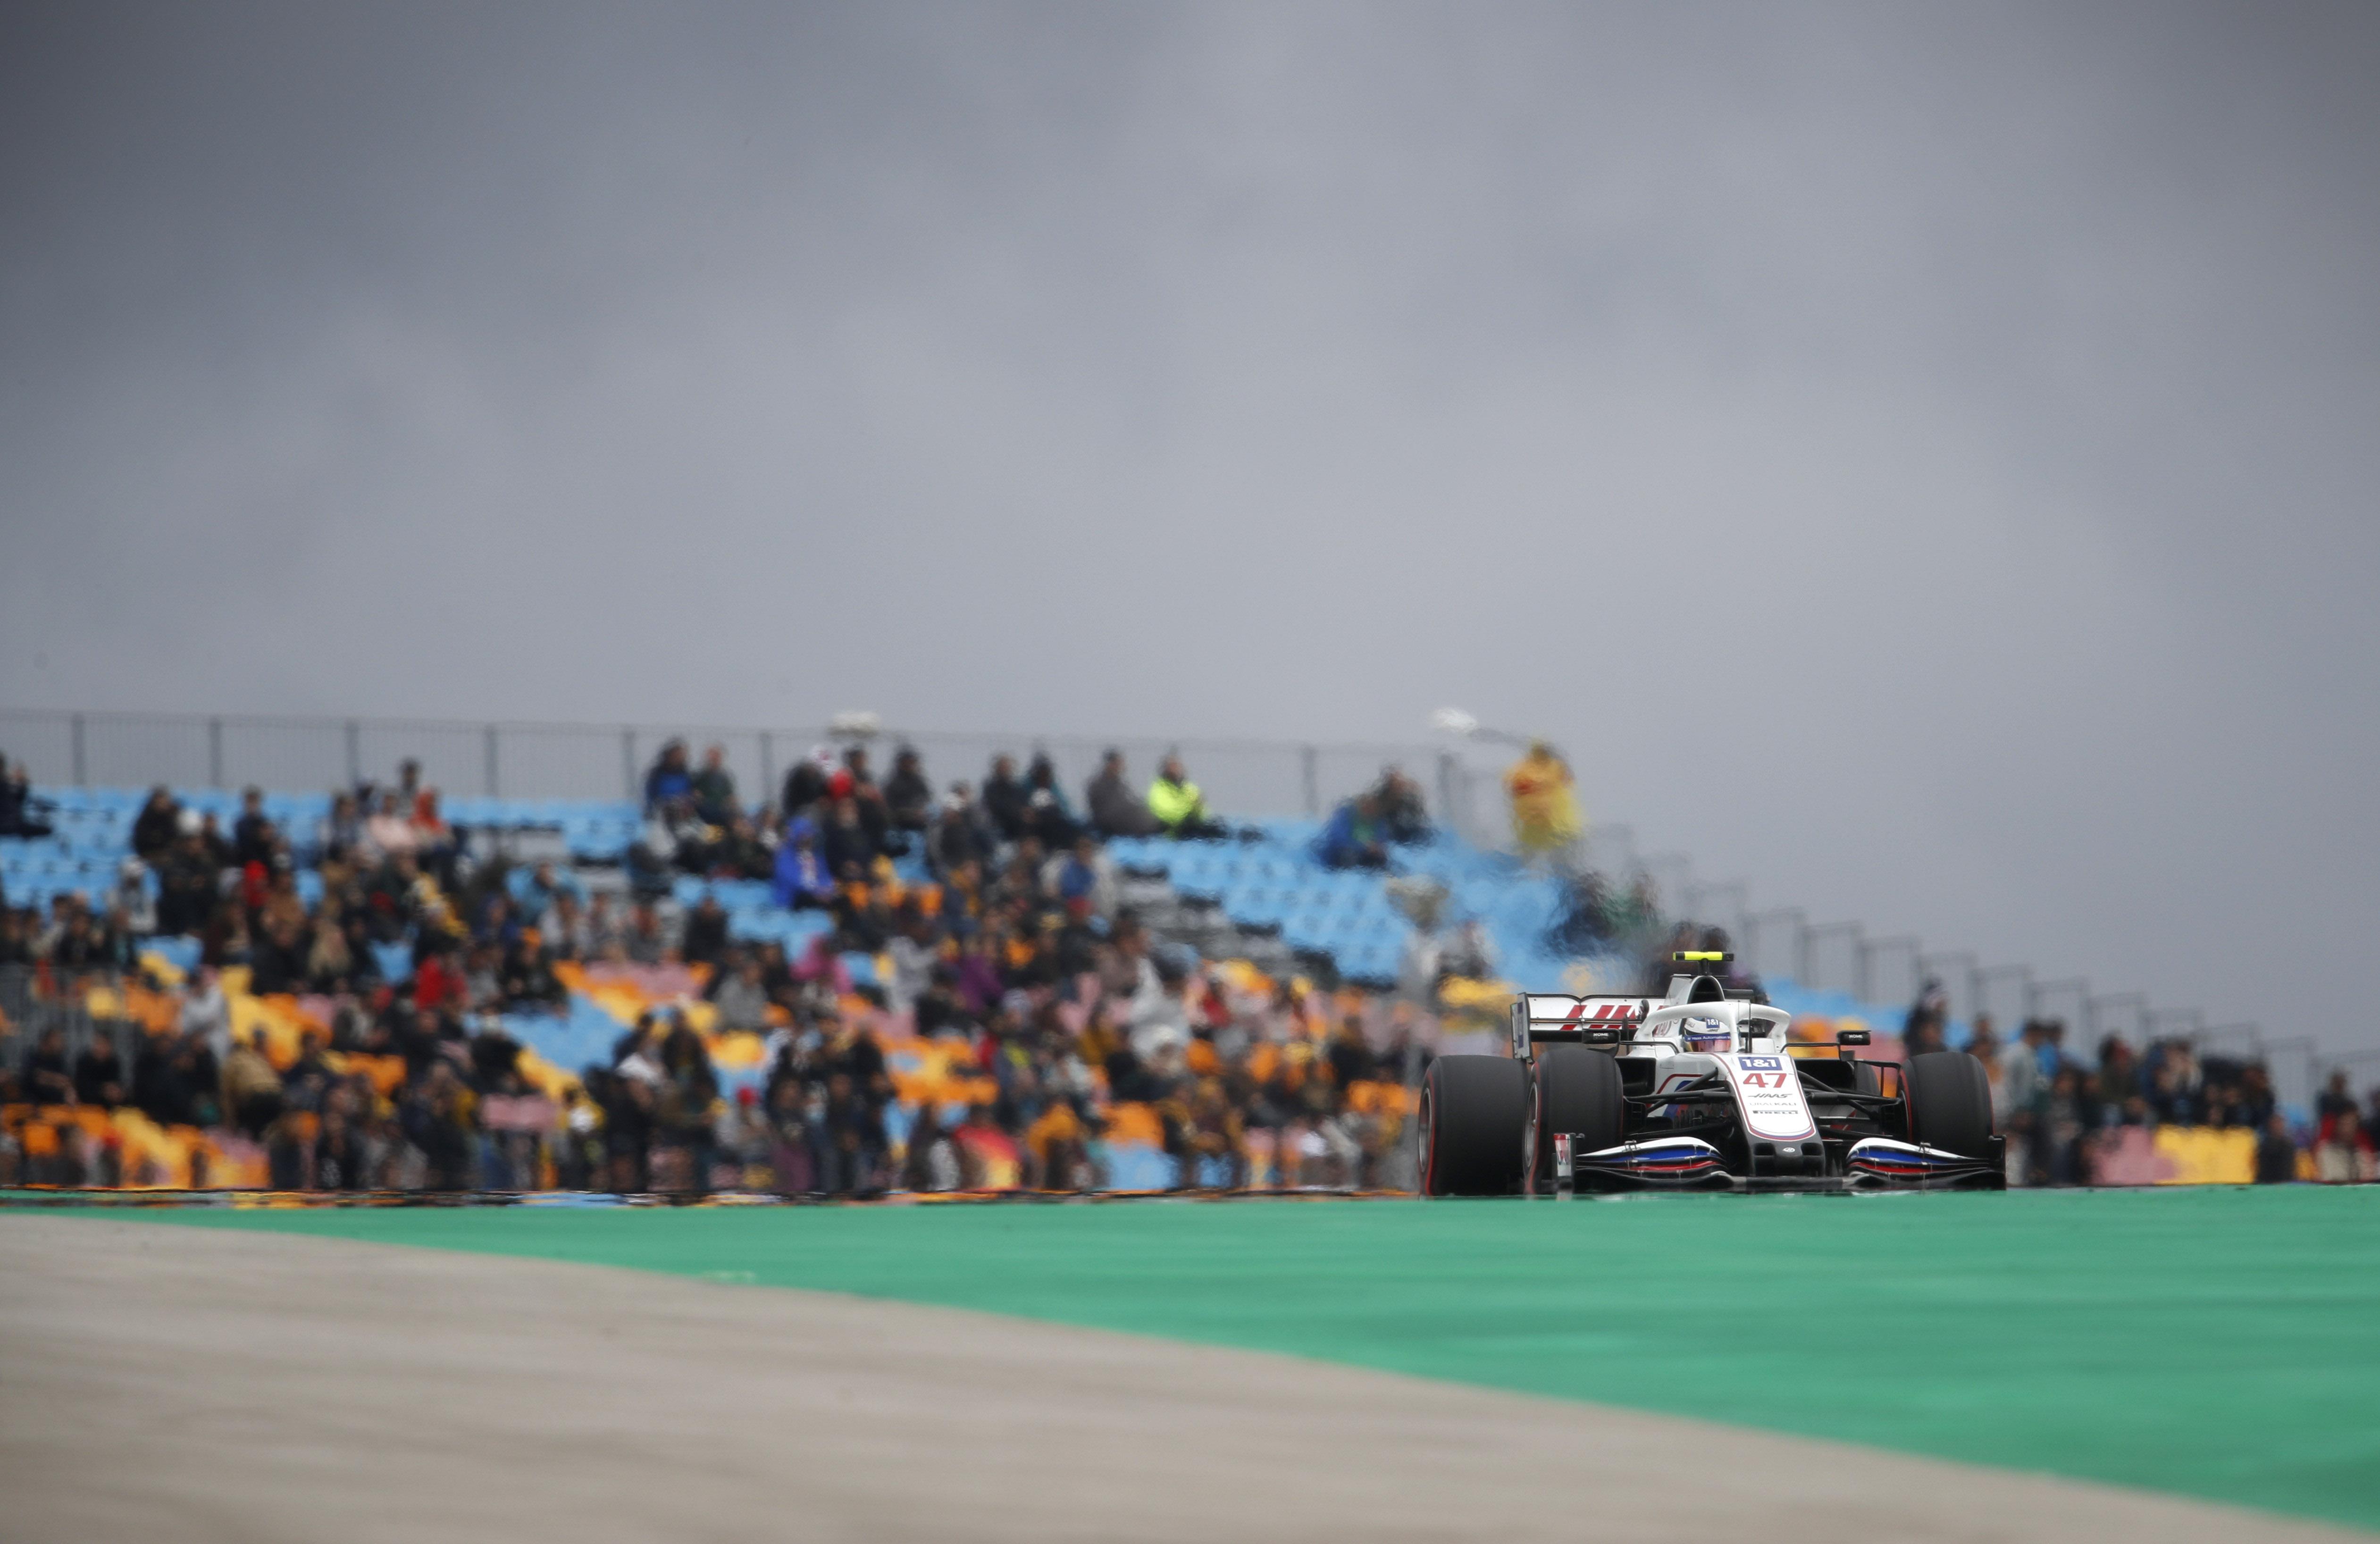 Mick Schumacher, Haas Vf 21